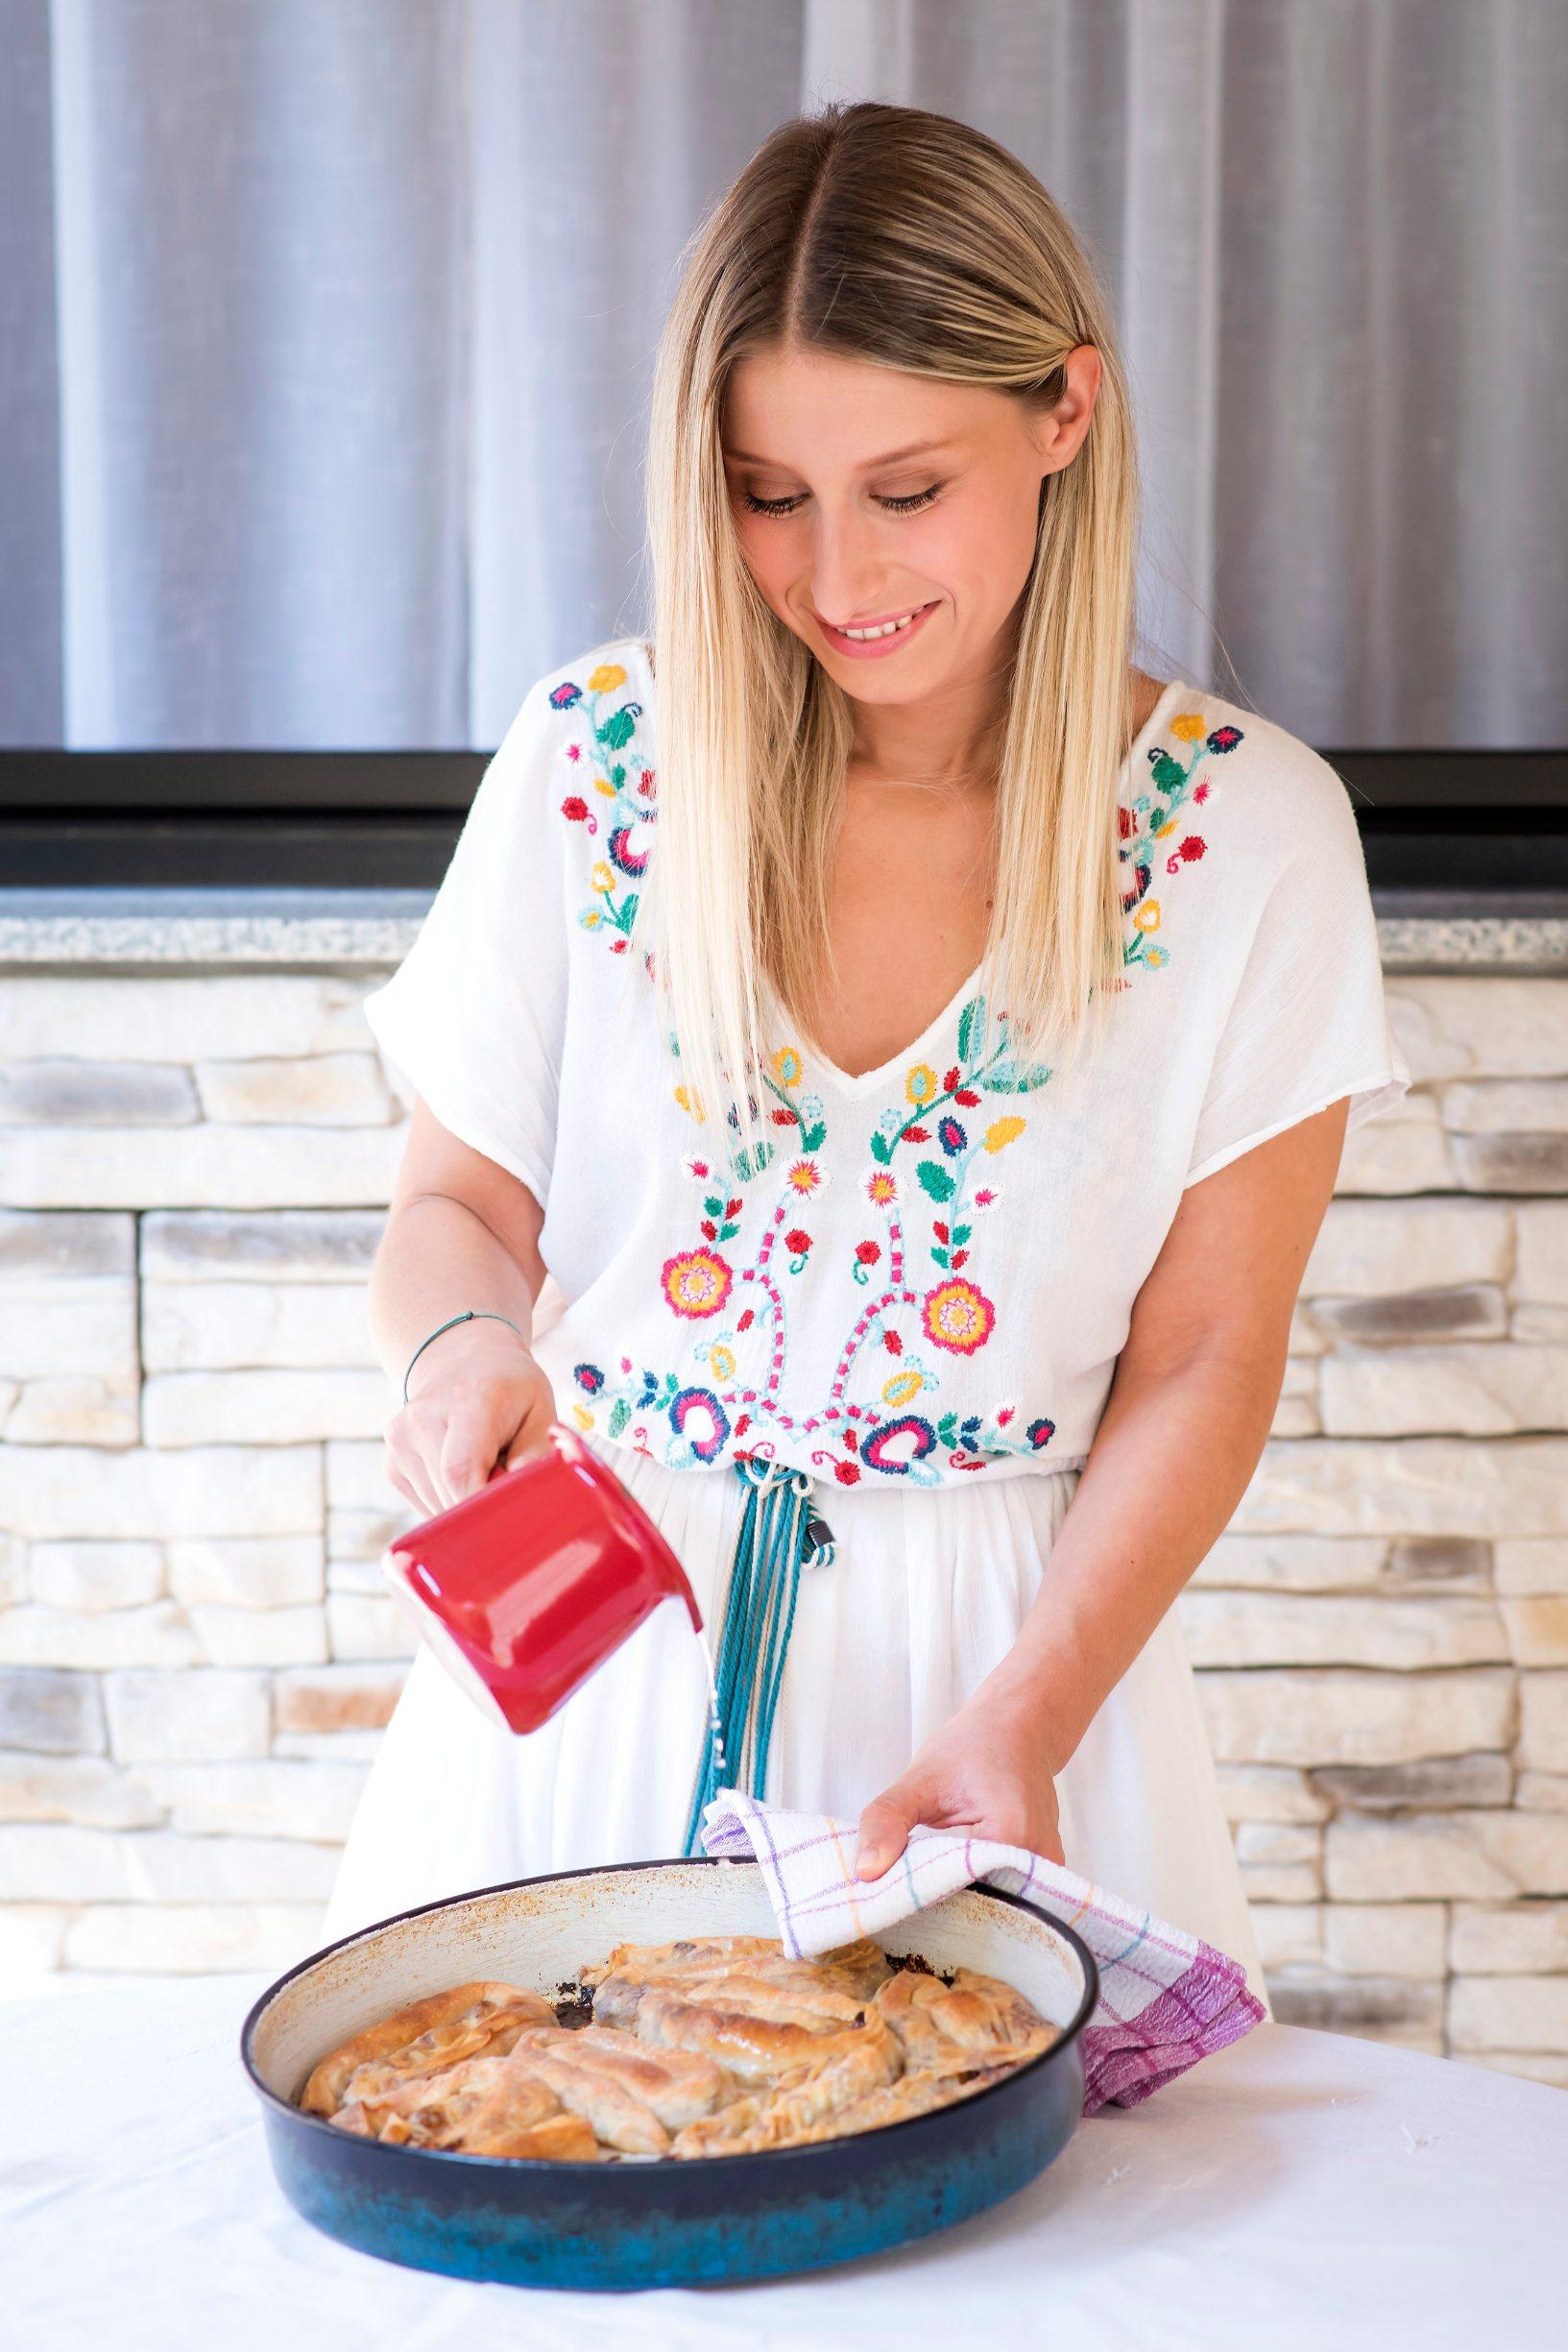 Zagreb, 260819. Anita Saric, novinarka Dobre hrane, izradjuje burek kako je naucila od mame. Foto: Neja Markicevic / CROPIX